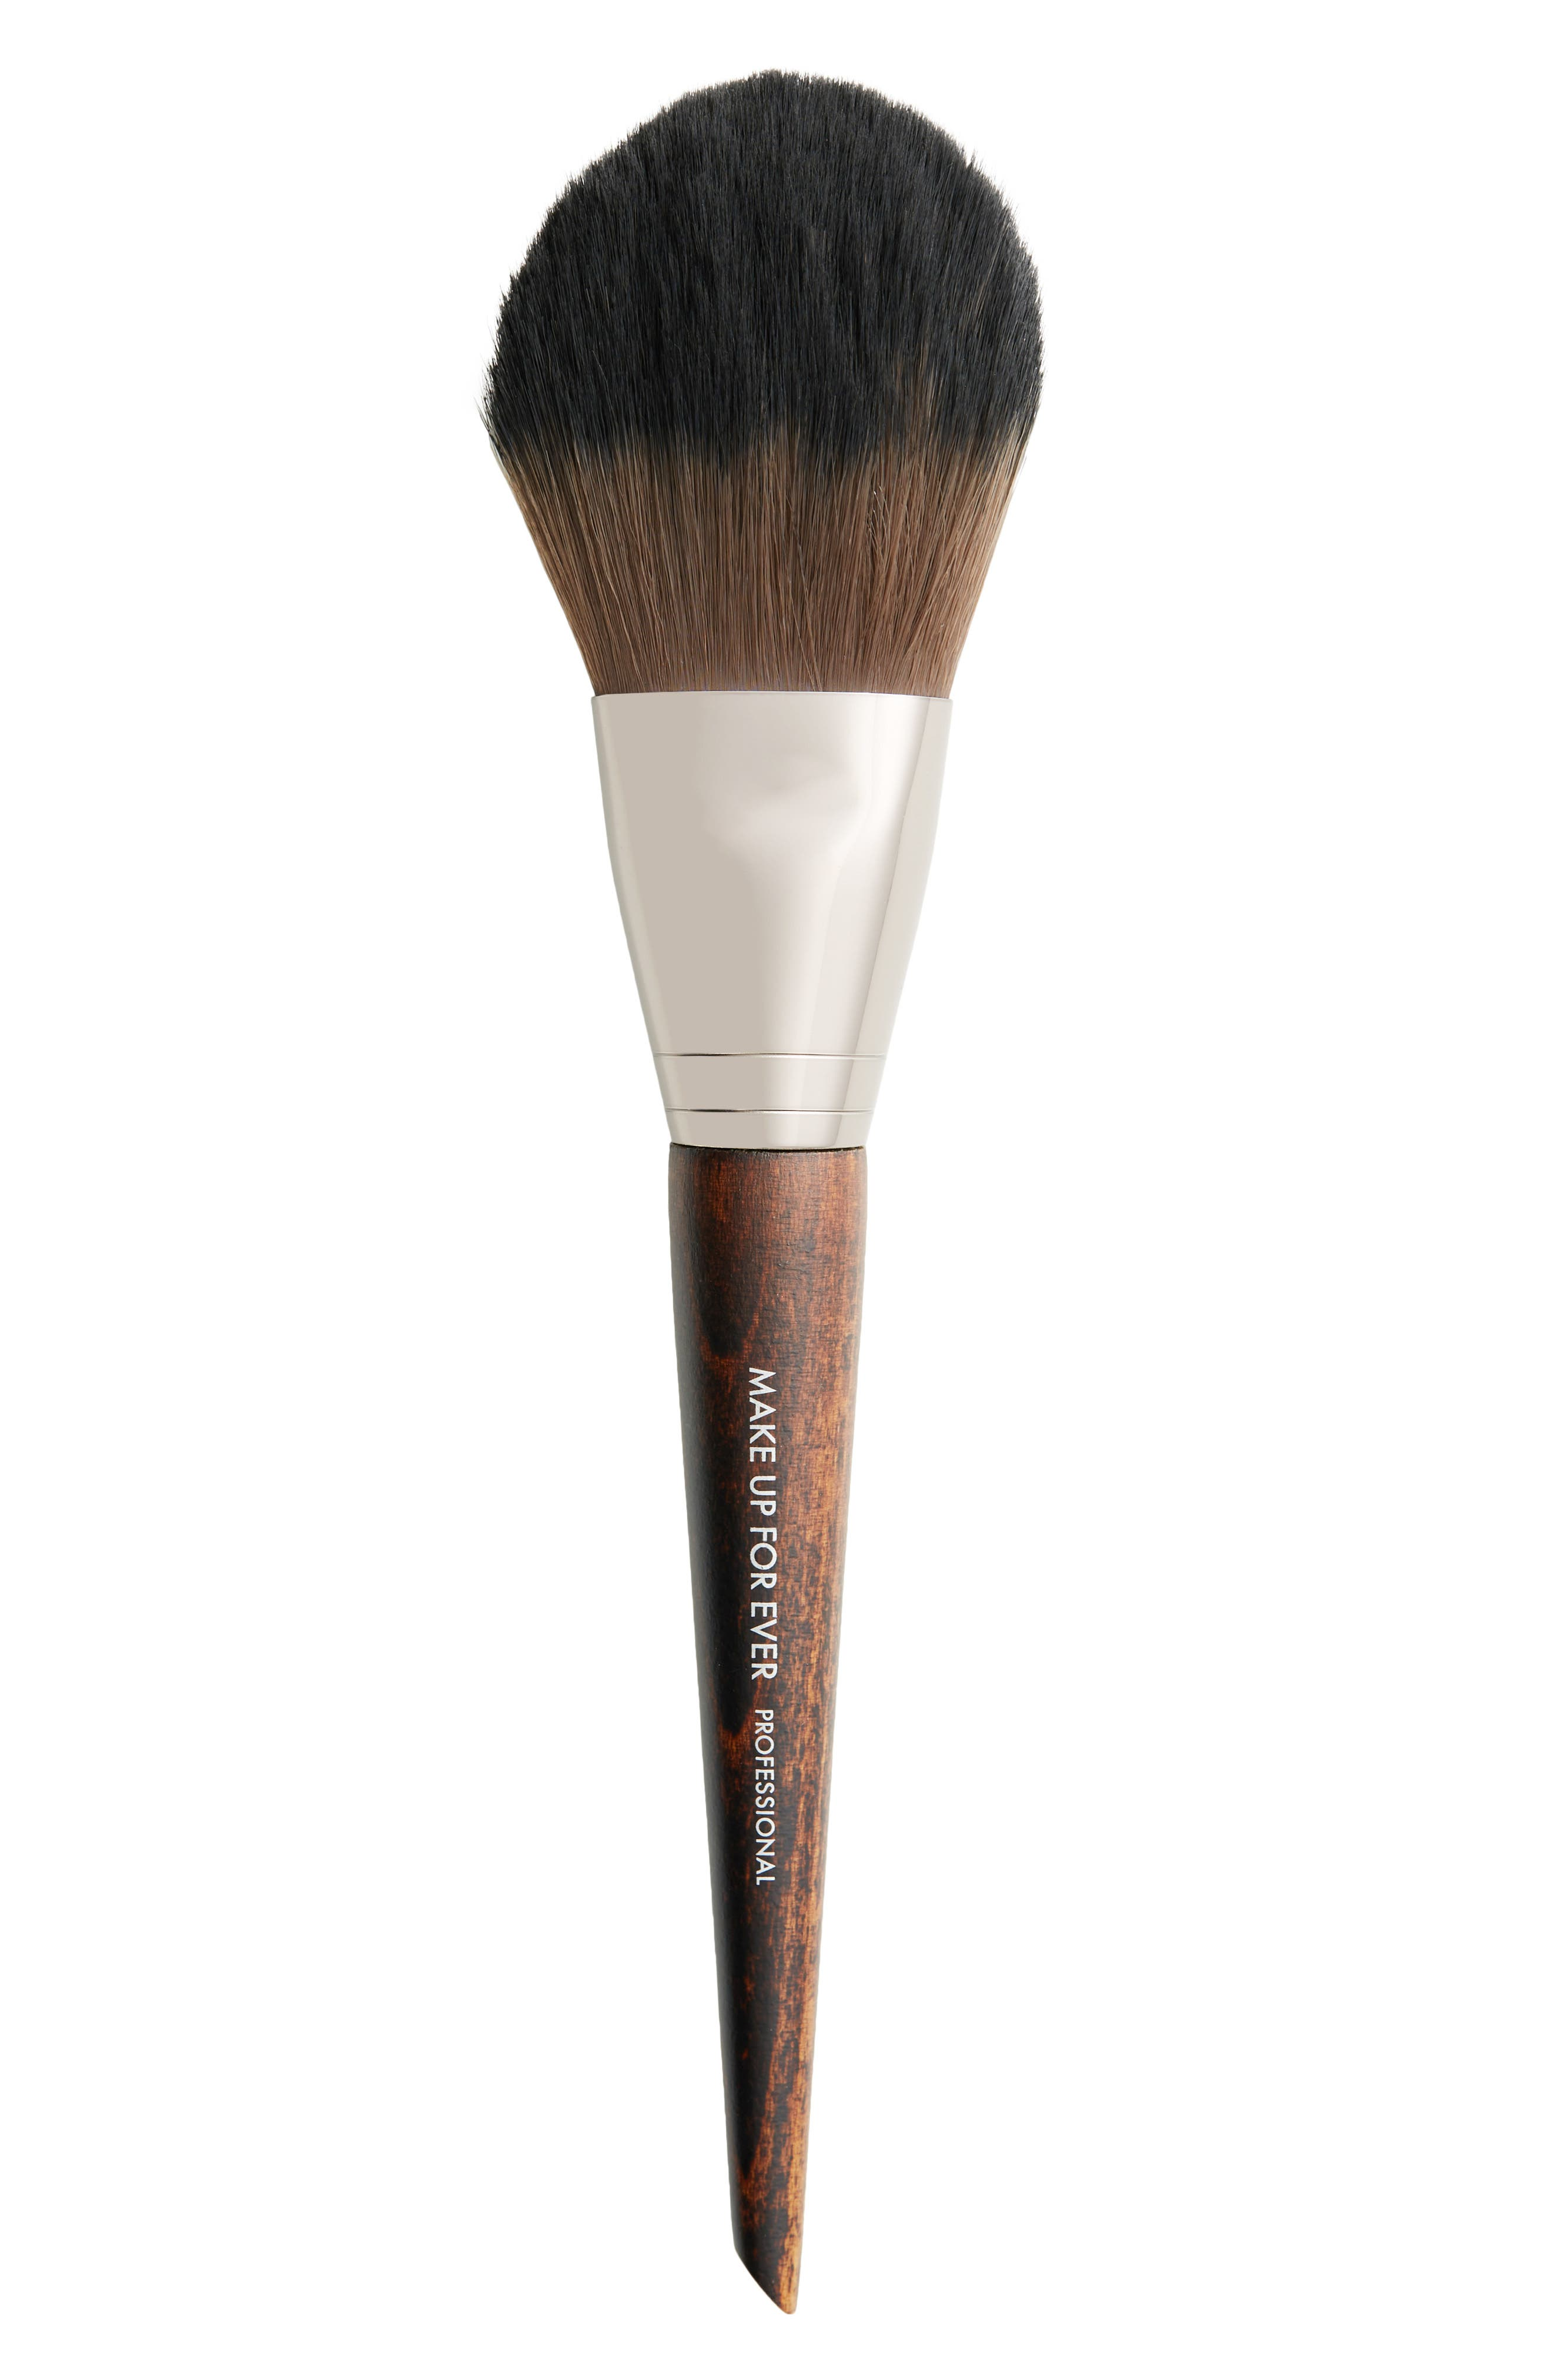 #128 Precision Powder Brush